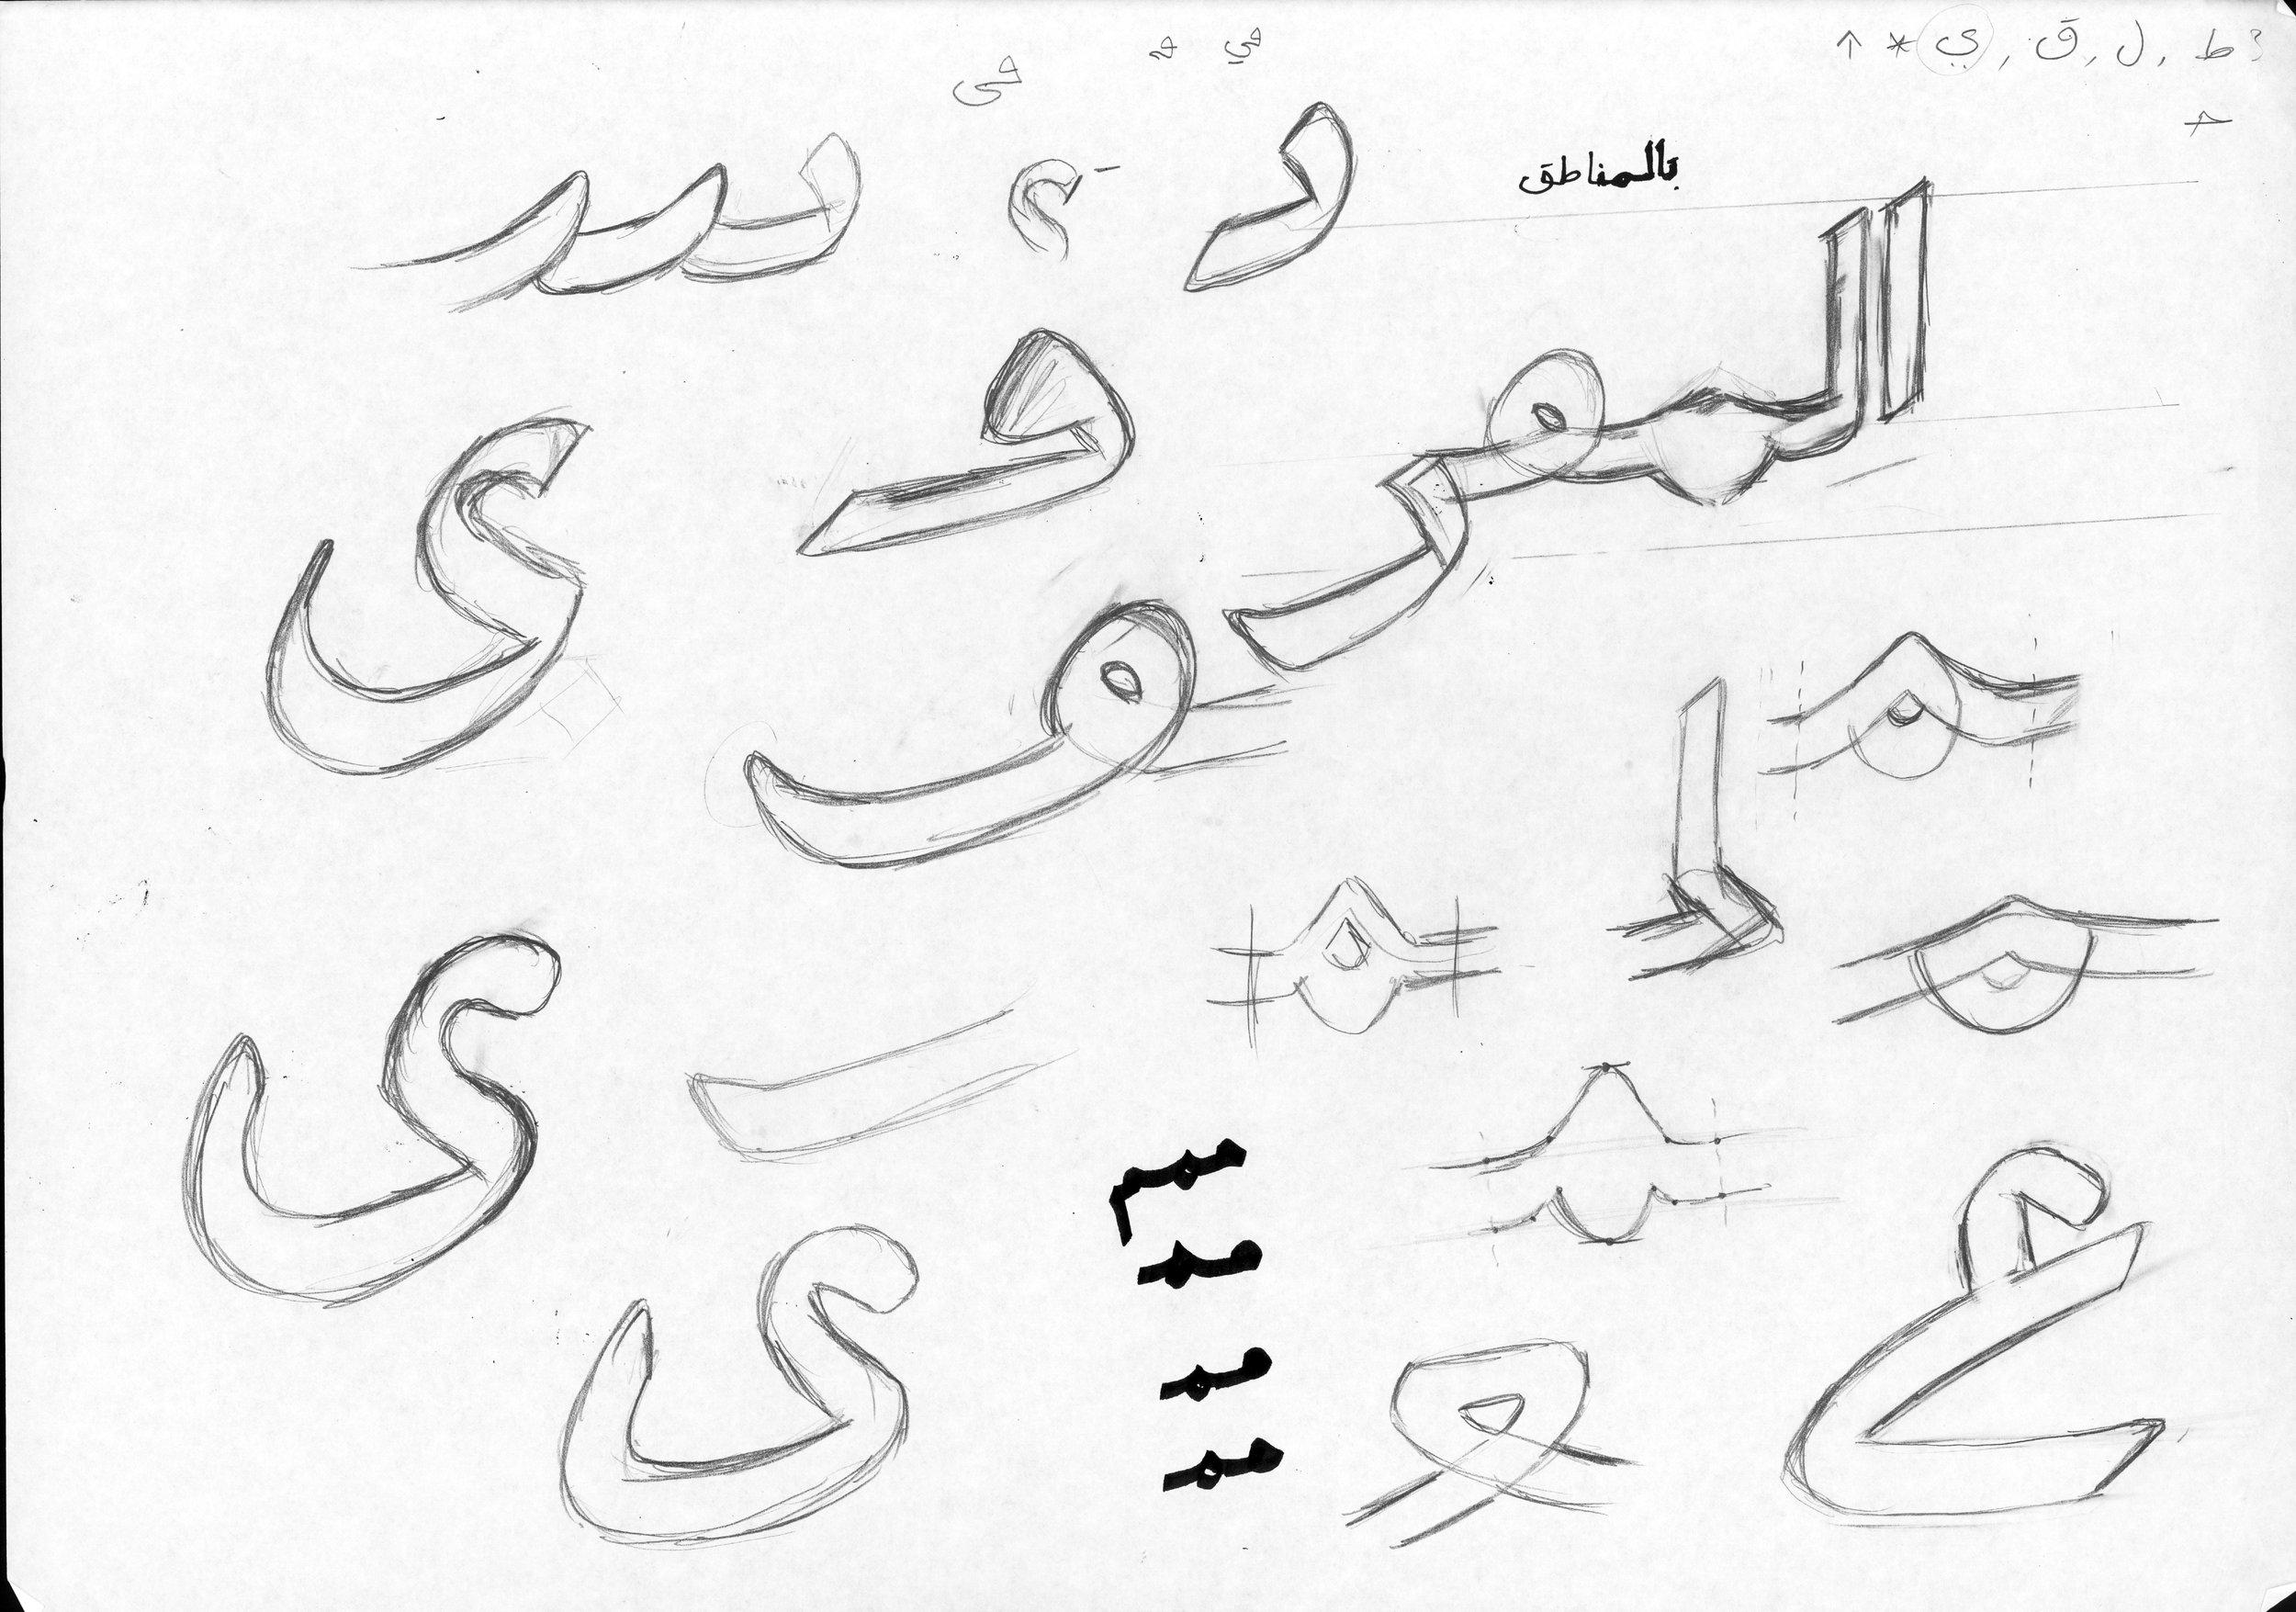 Huda_Sketches09.jpg